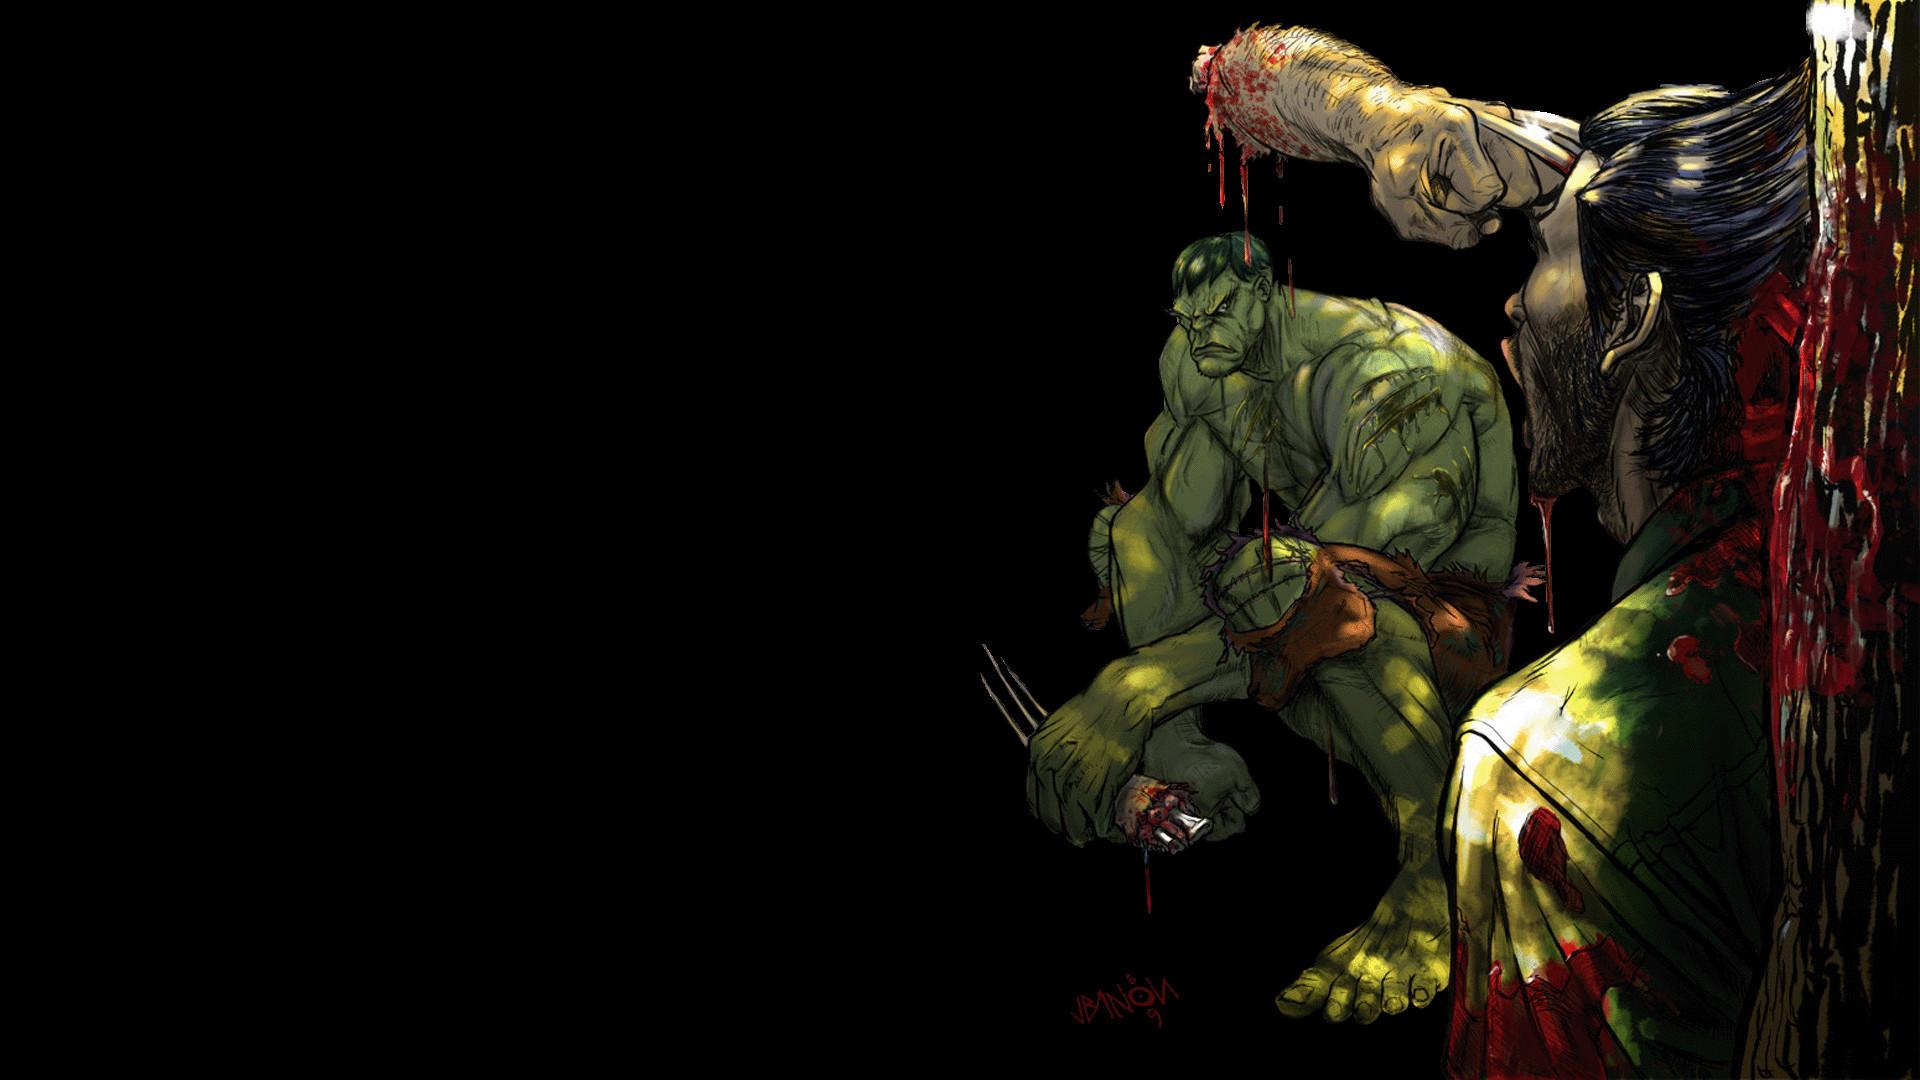 Res: 1920x1080, hulk vs wolverine 748920